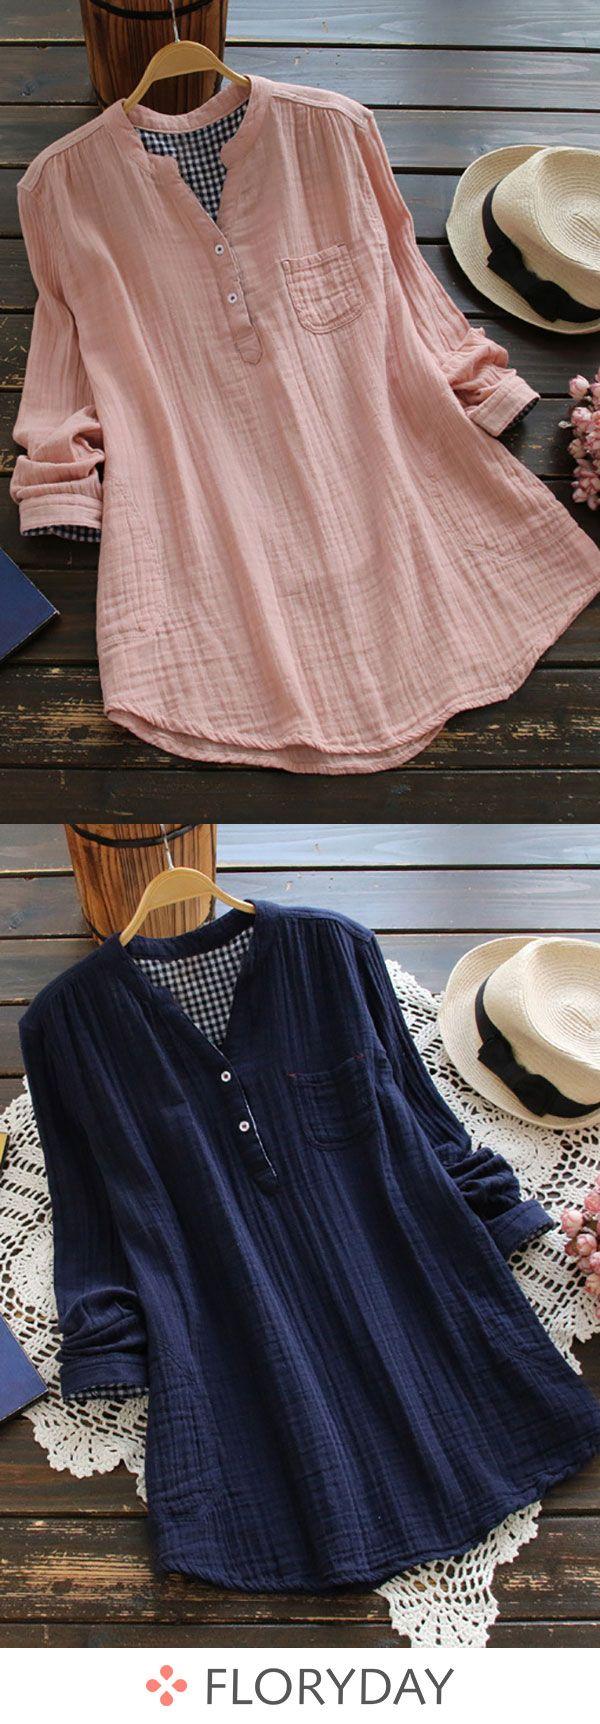 Solid Elegant Cotton Round Neckline Long Sleeve Blouses Item Code: #1145263 US$ 43.99